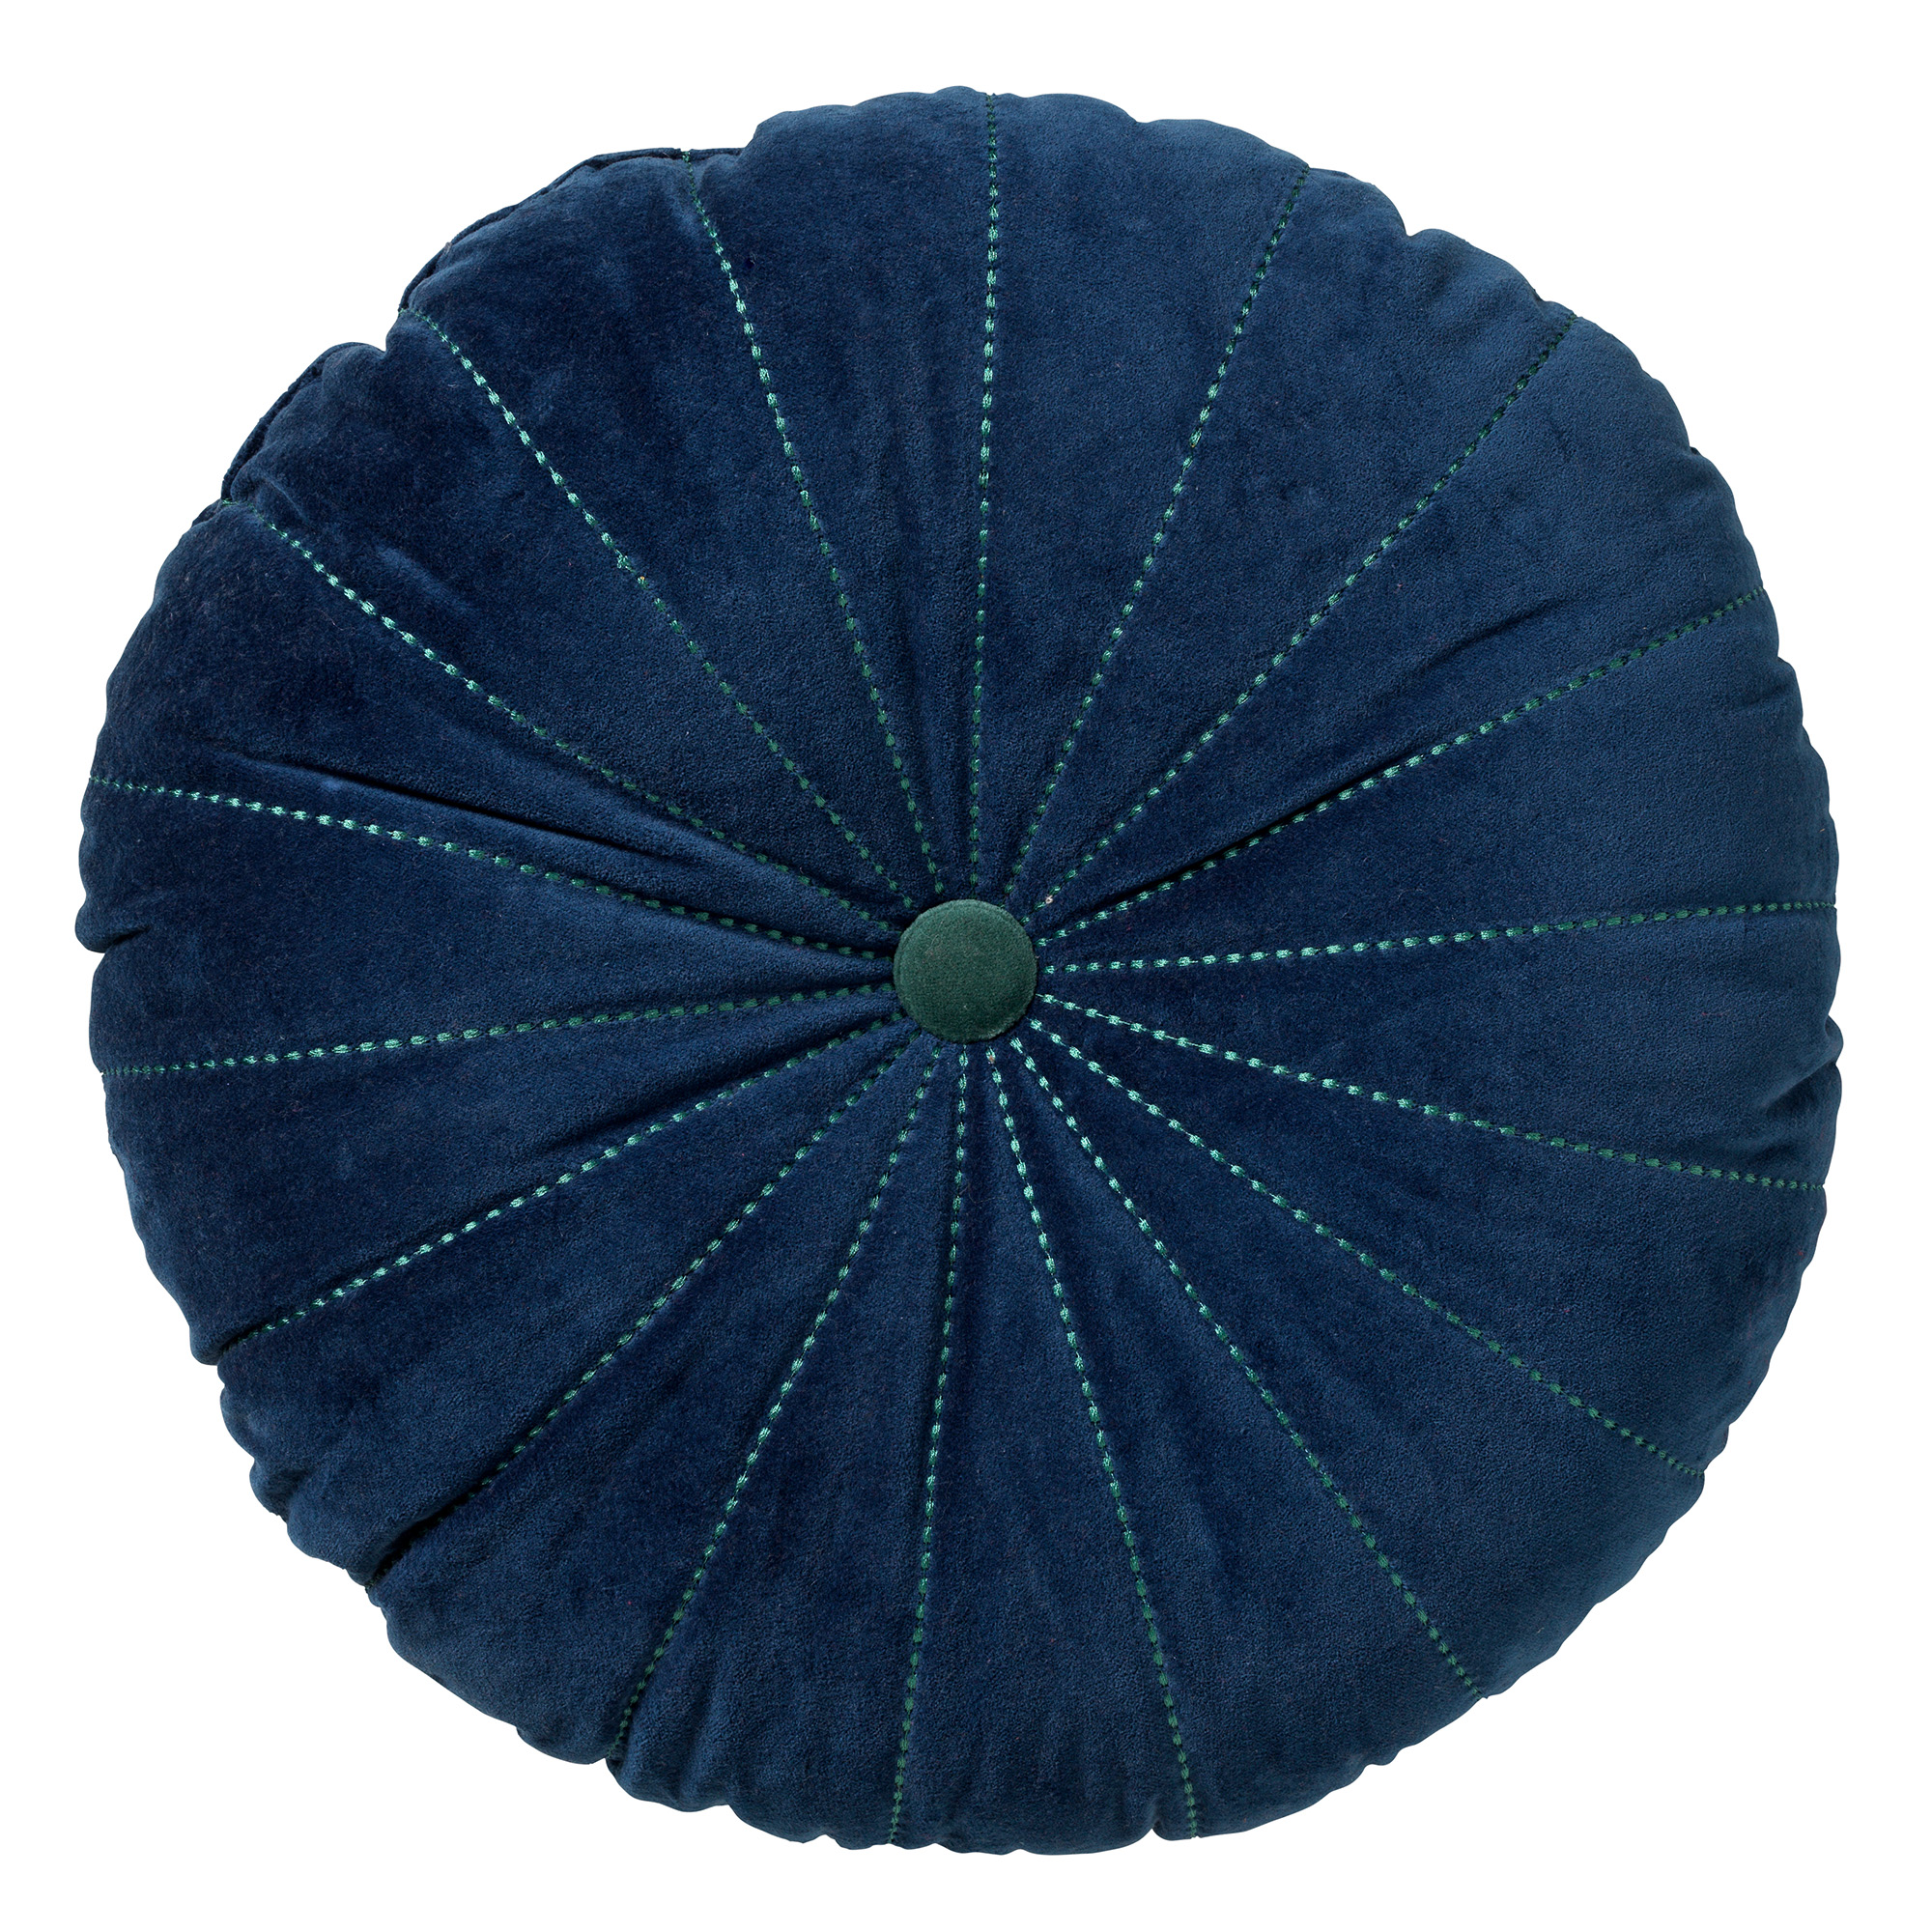 Kussen Maan 50 cm Insignia Blue